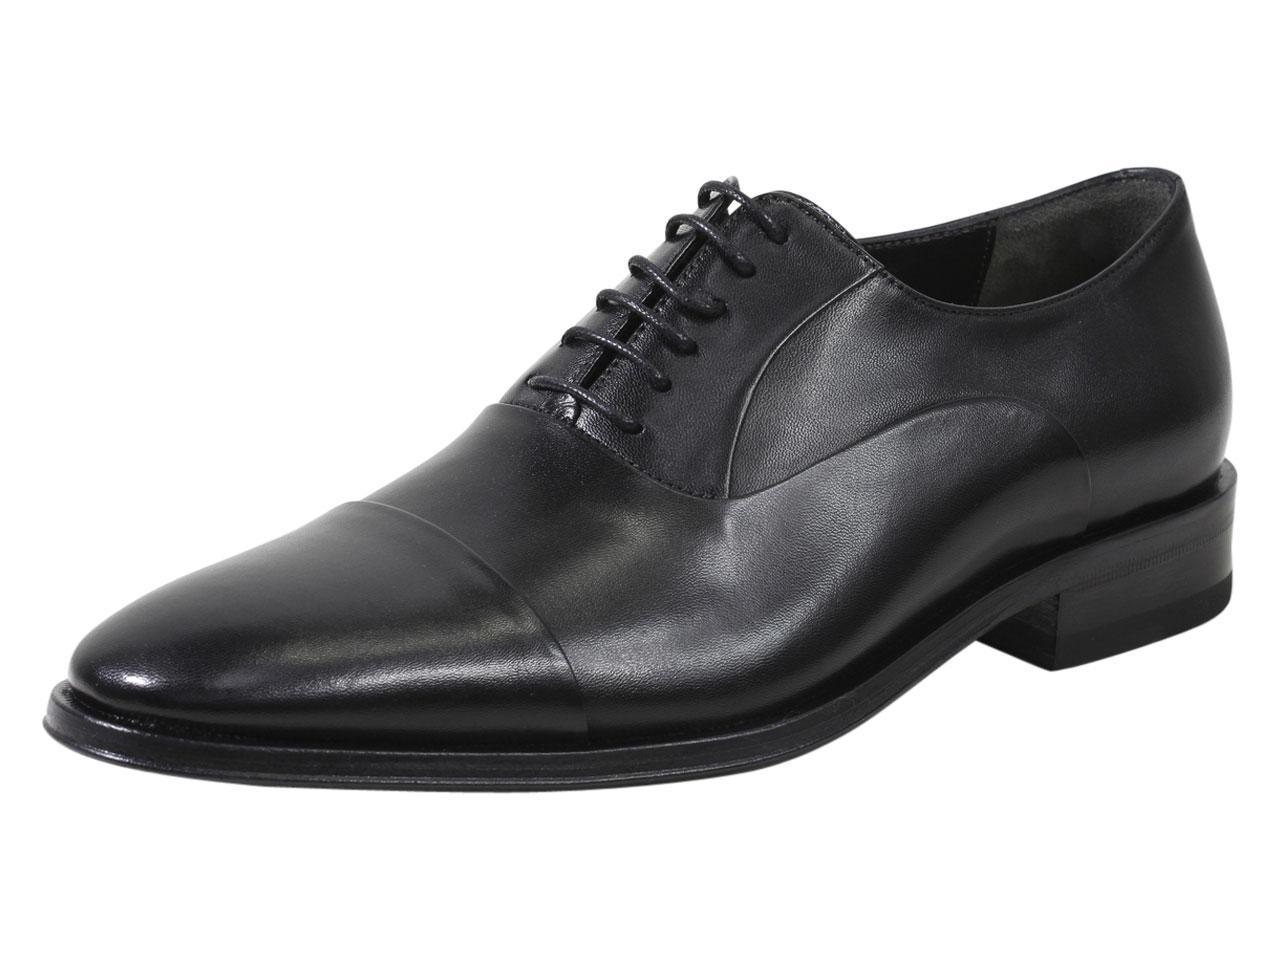 Image of Bruno Magli Men's Maioco Leather Oxfords Shoes - Black - 10 D(M) US